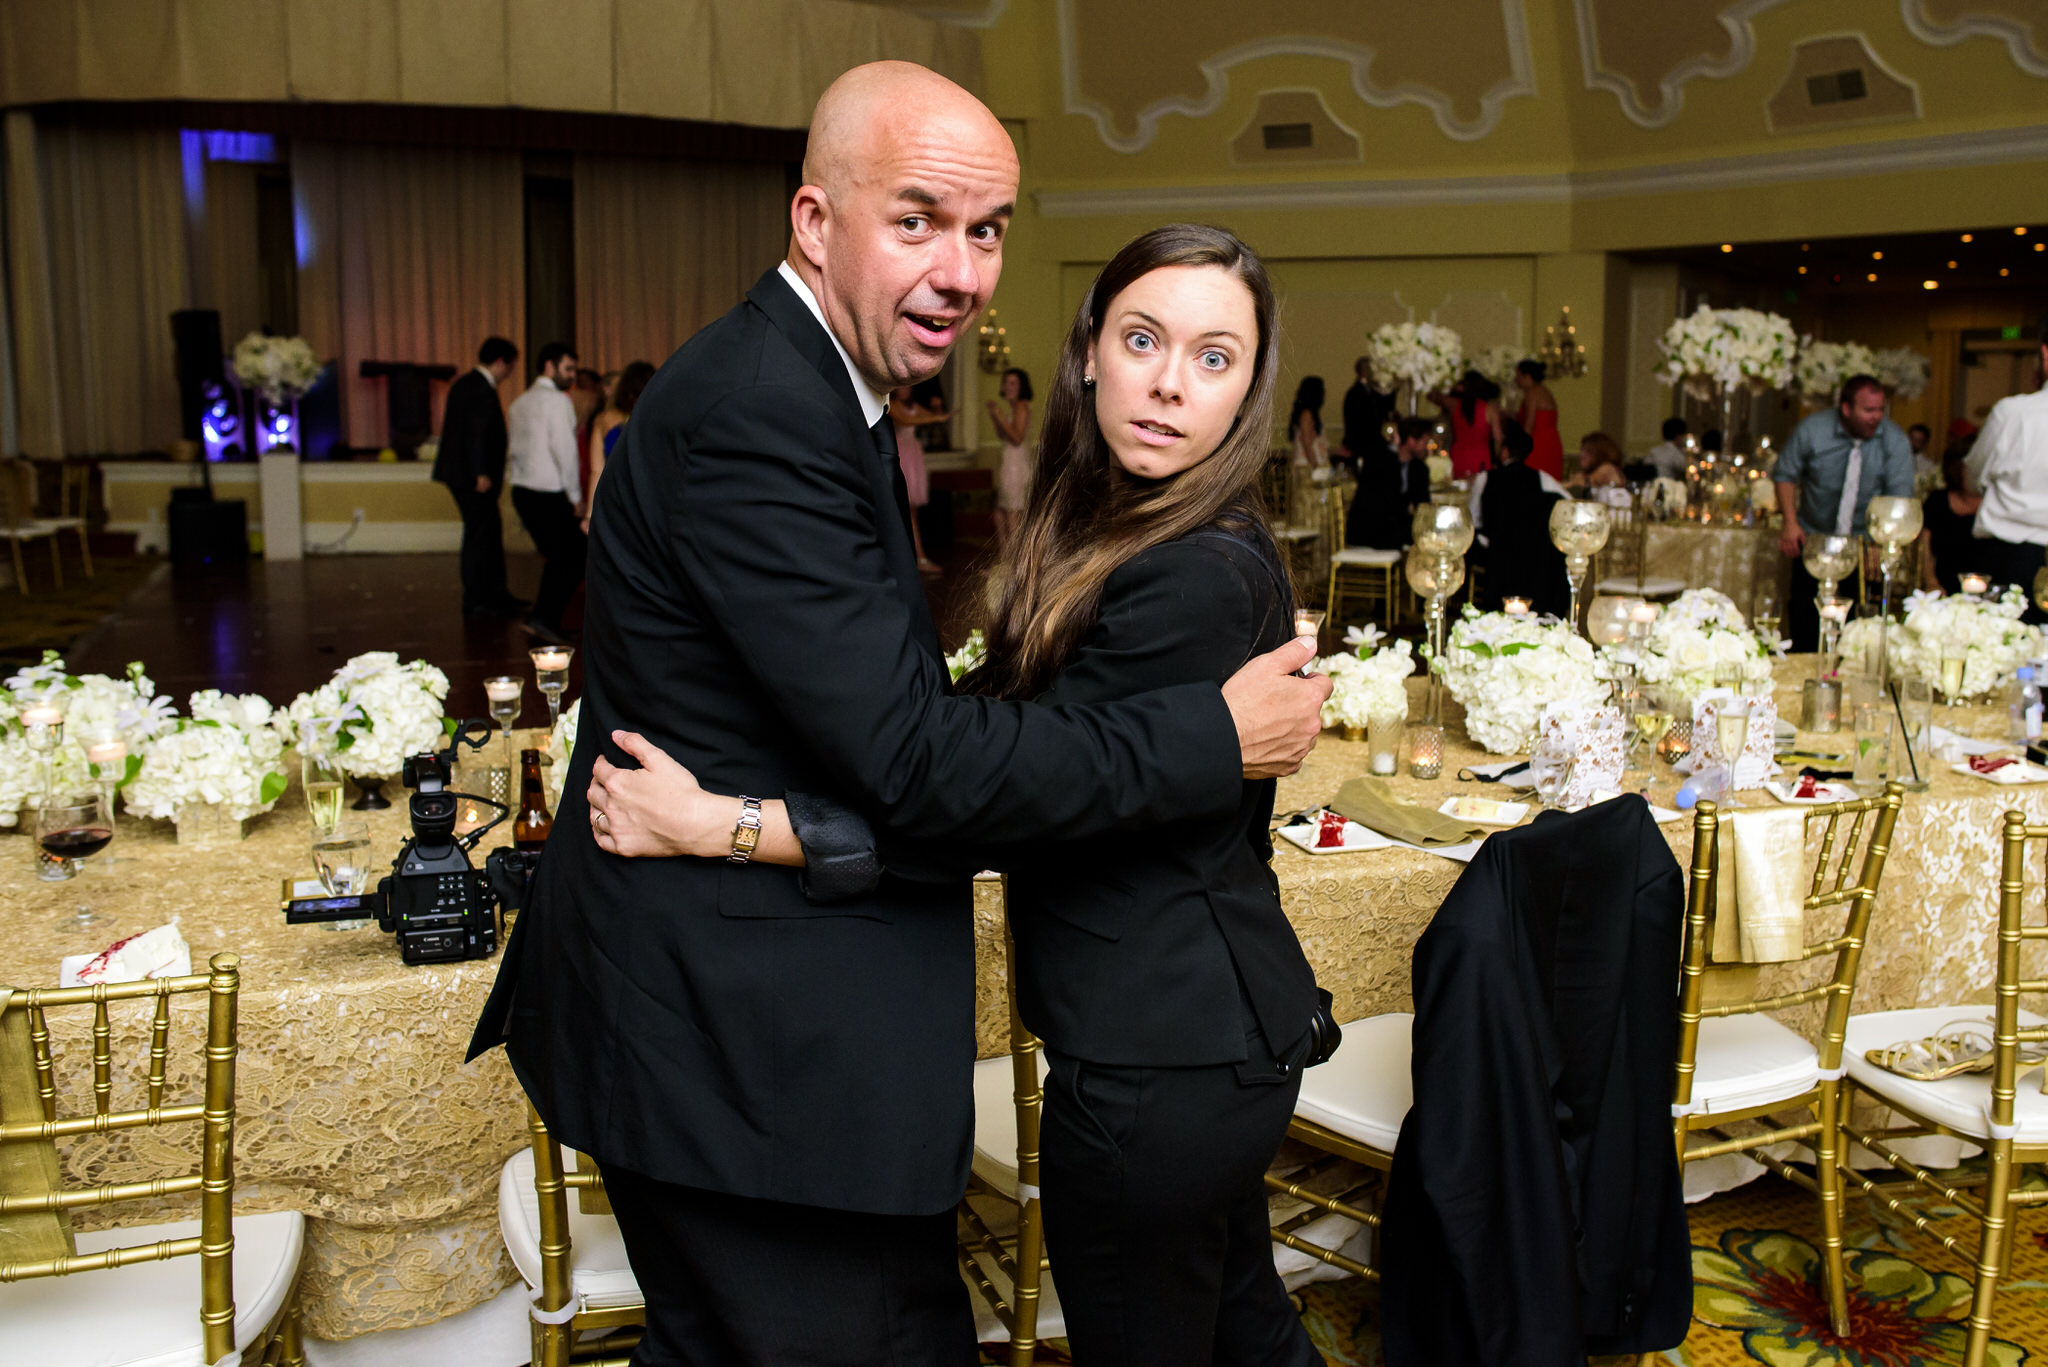 Abby and Chris' wedding at the Hotel del Coronado in Coronado, California.